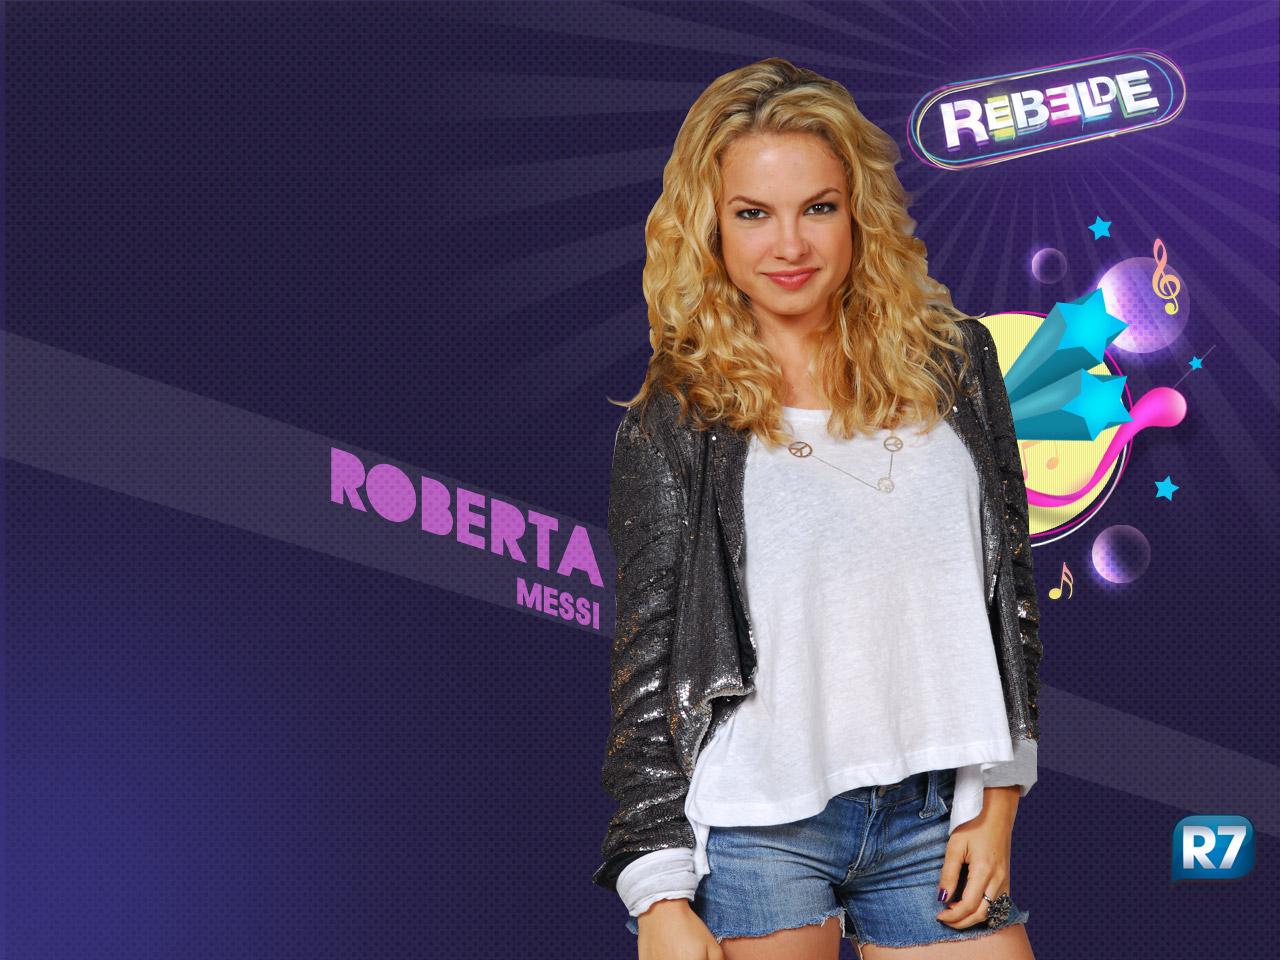 http://3.bp.blogspot.com/-KRSdIBidMA0/TeDoDo2a_1I/AAAAAAAAAI8/Ihb_X4sexBQ/s1600/roberta-rebelde-1280x960.jpg